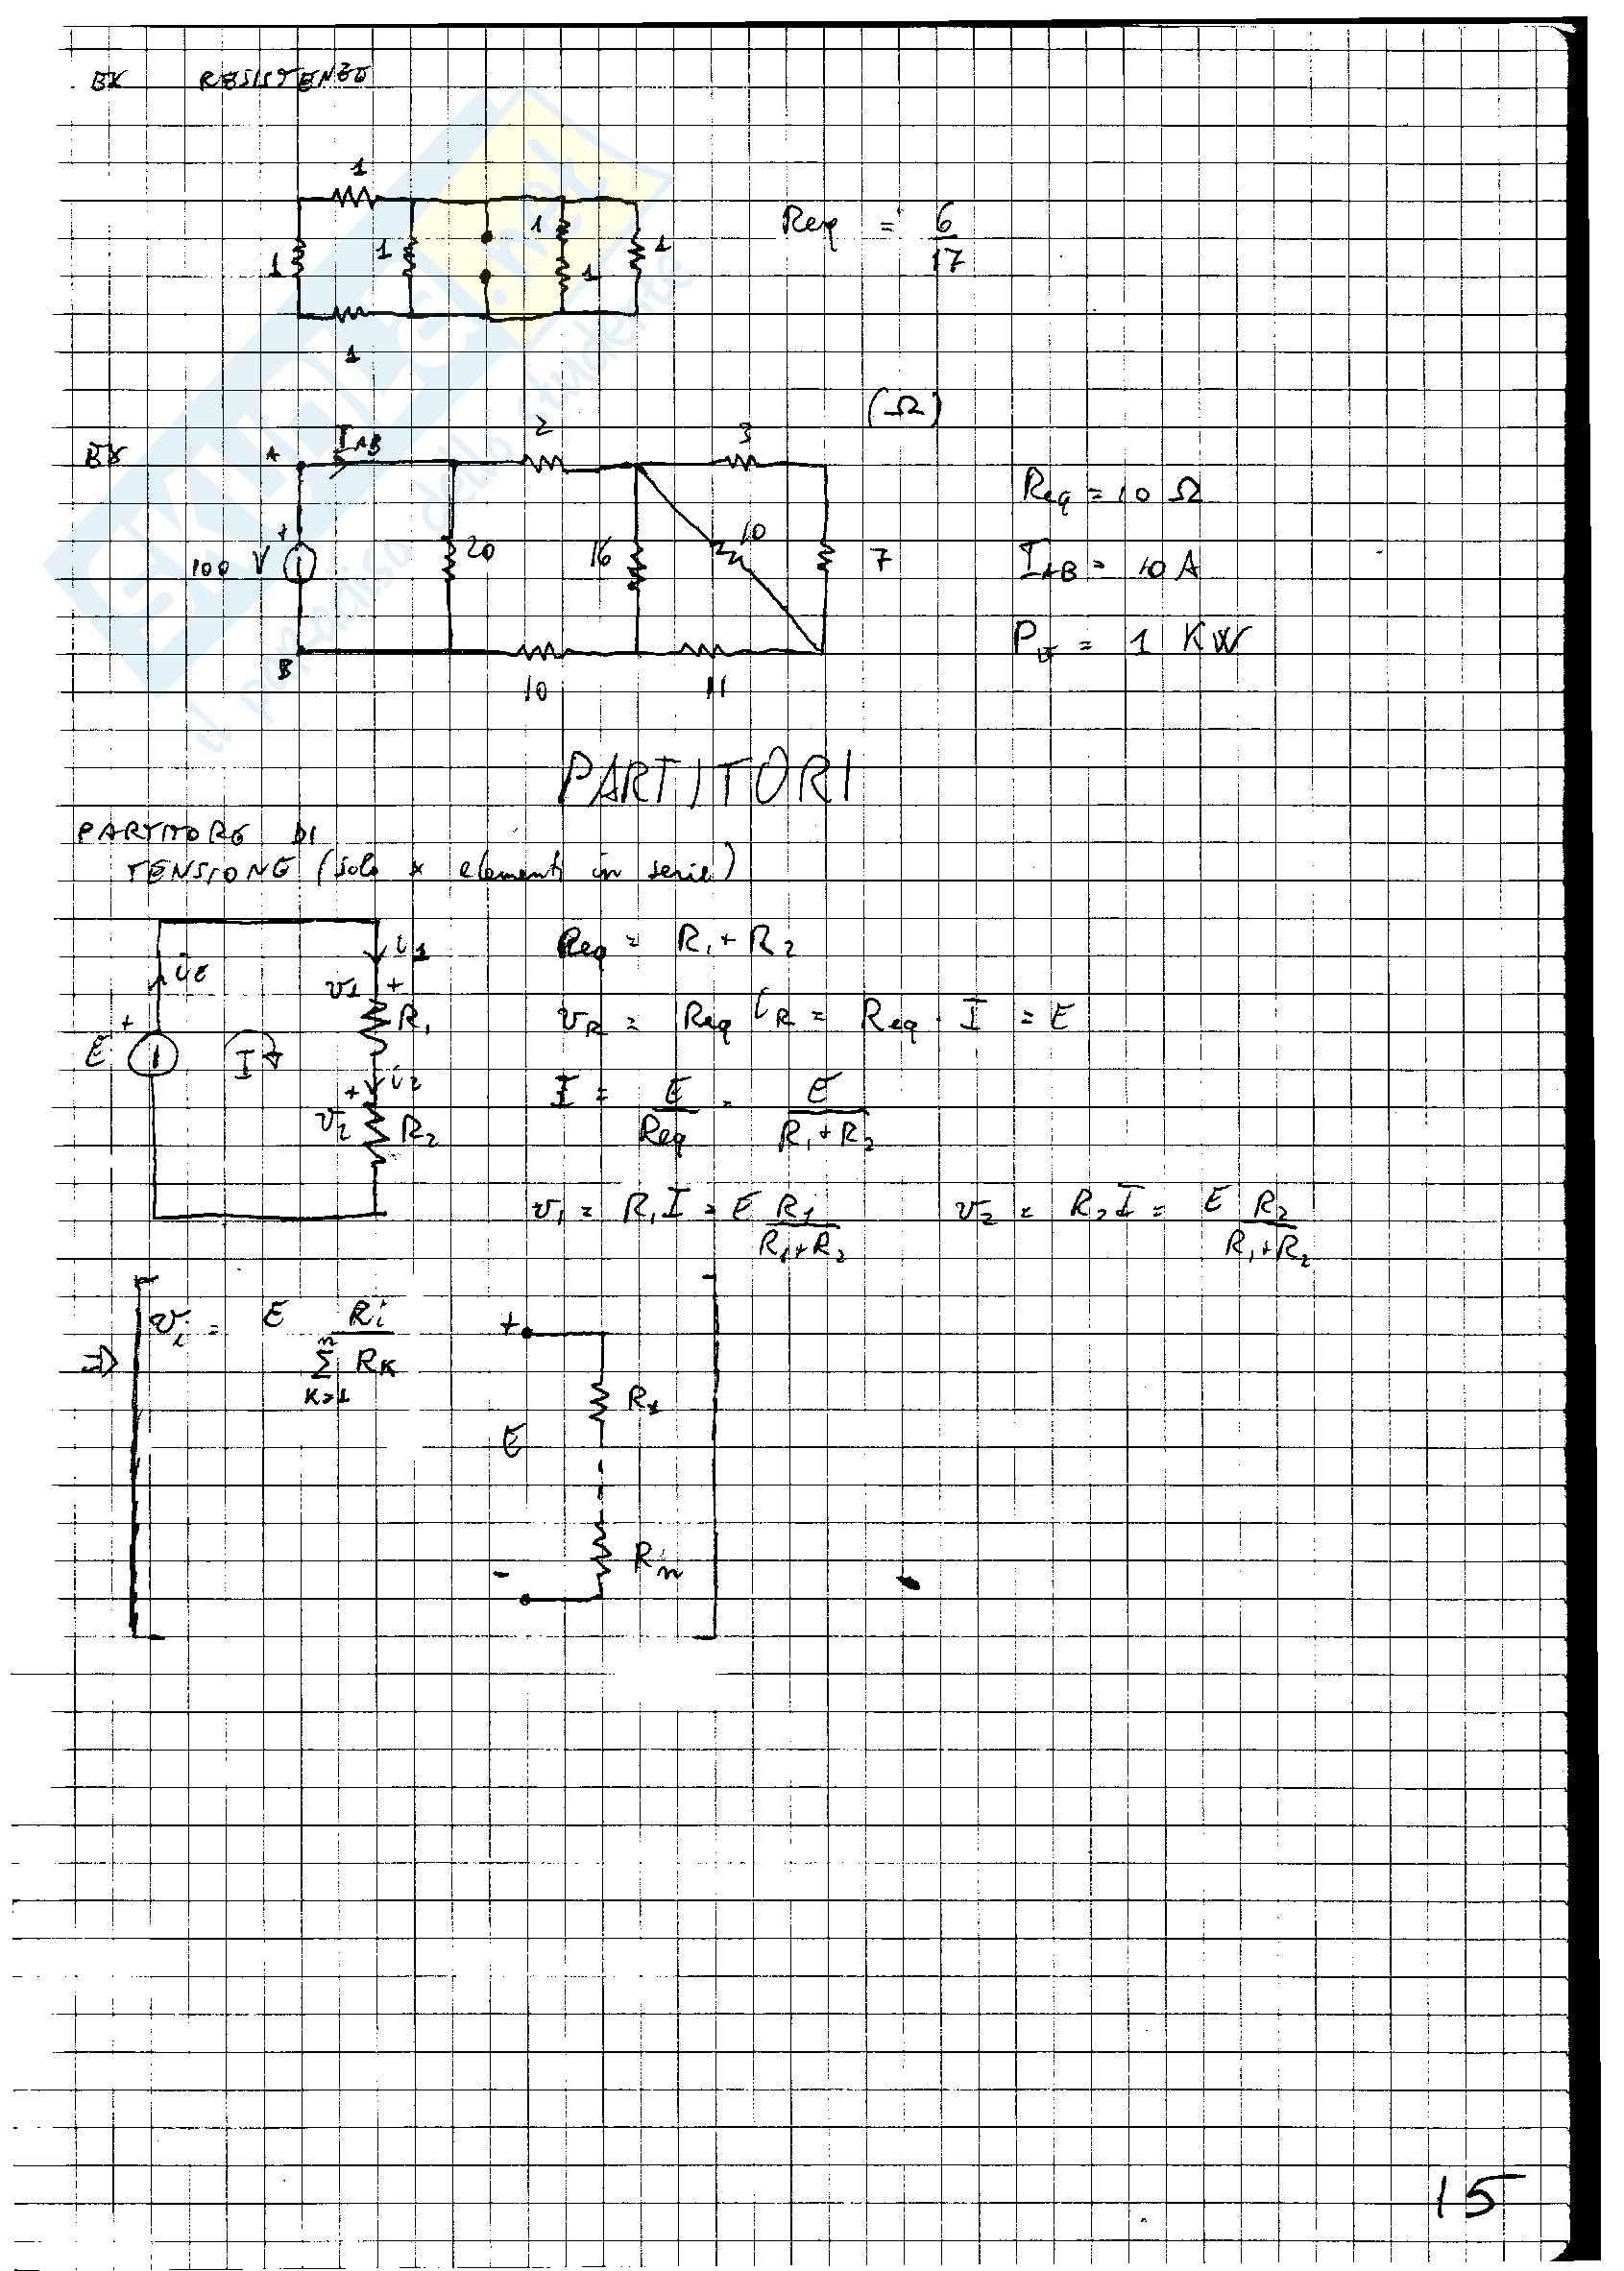 Elettrotecnica - Appunti Pag. 16